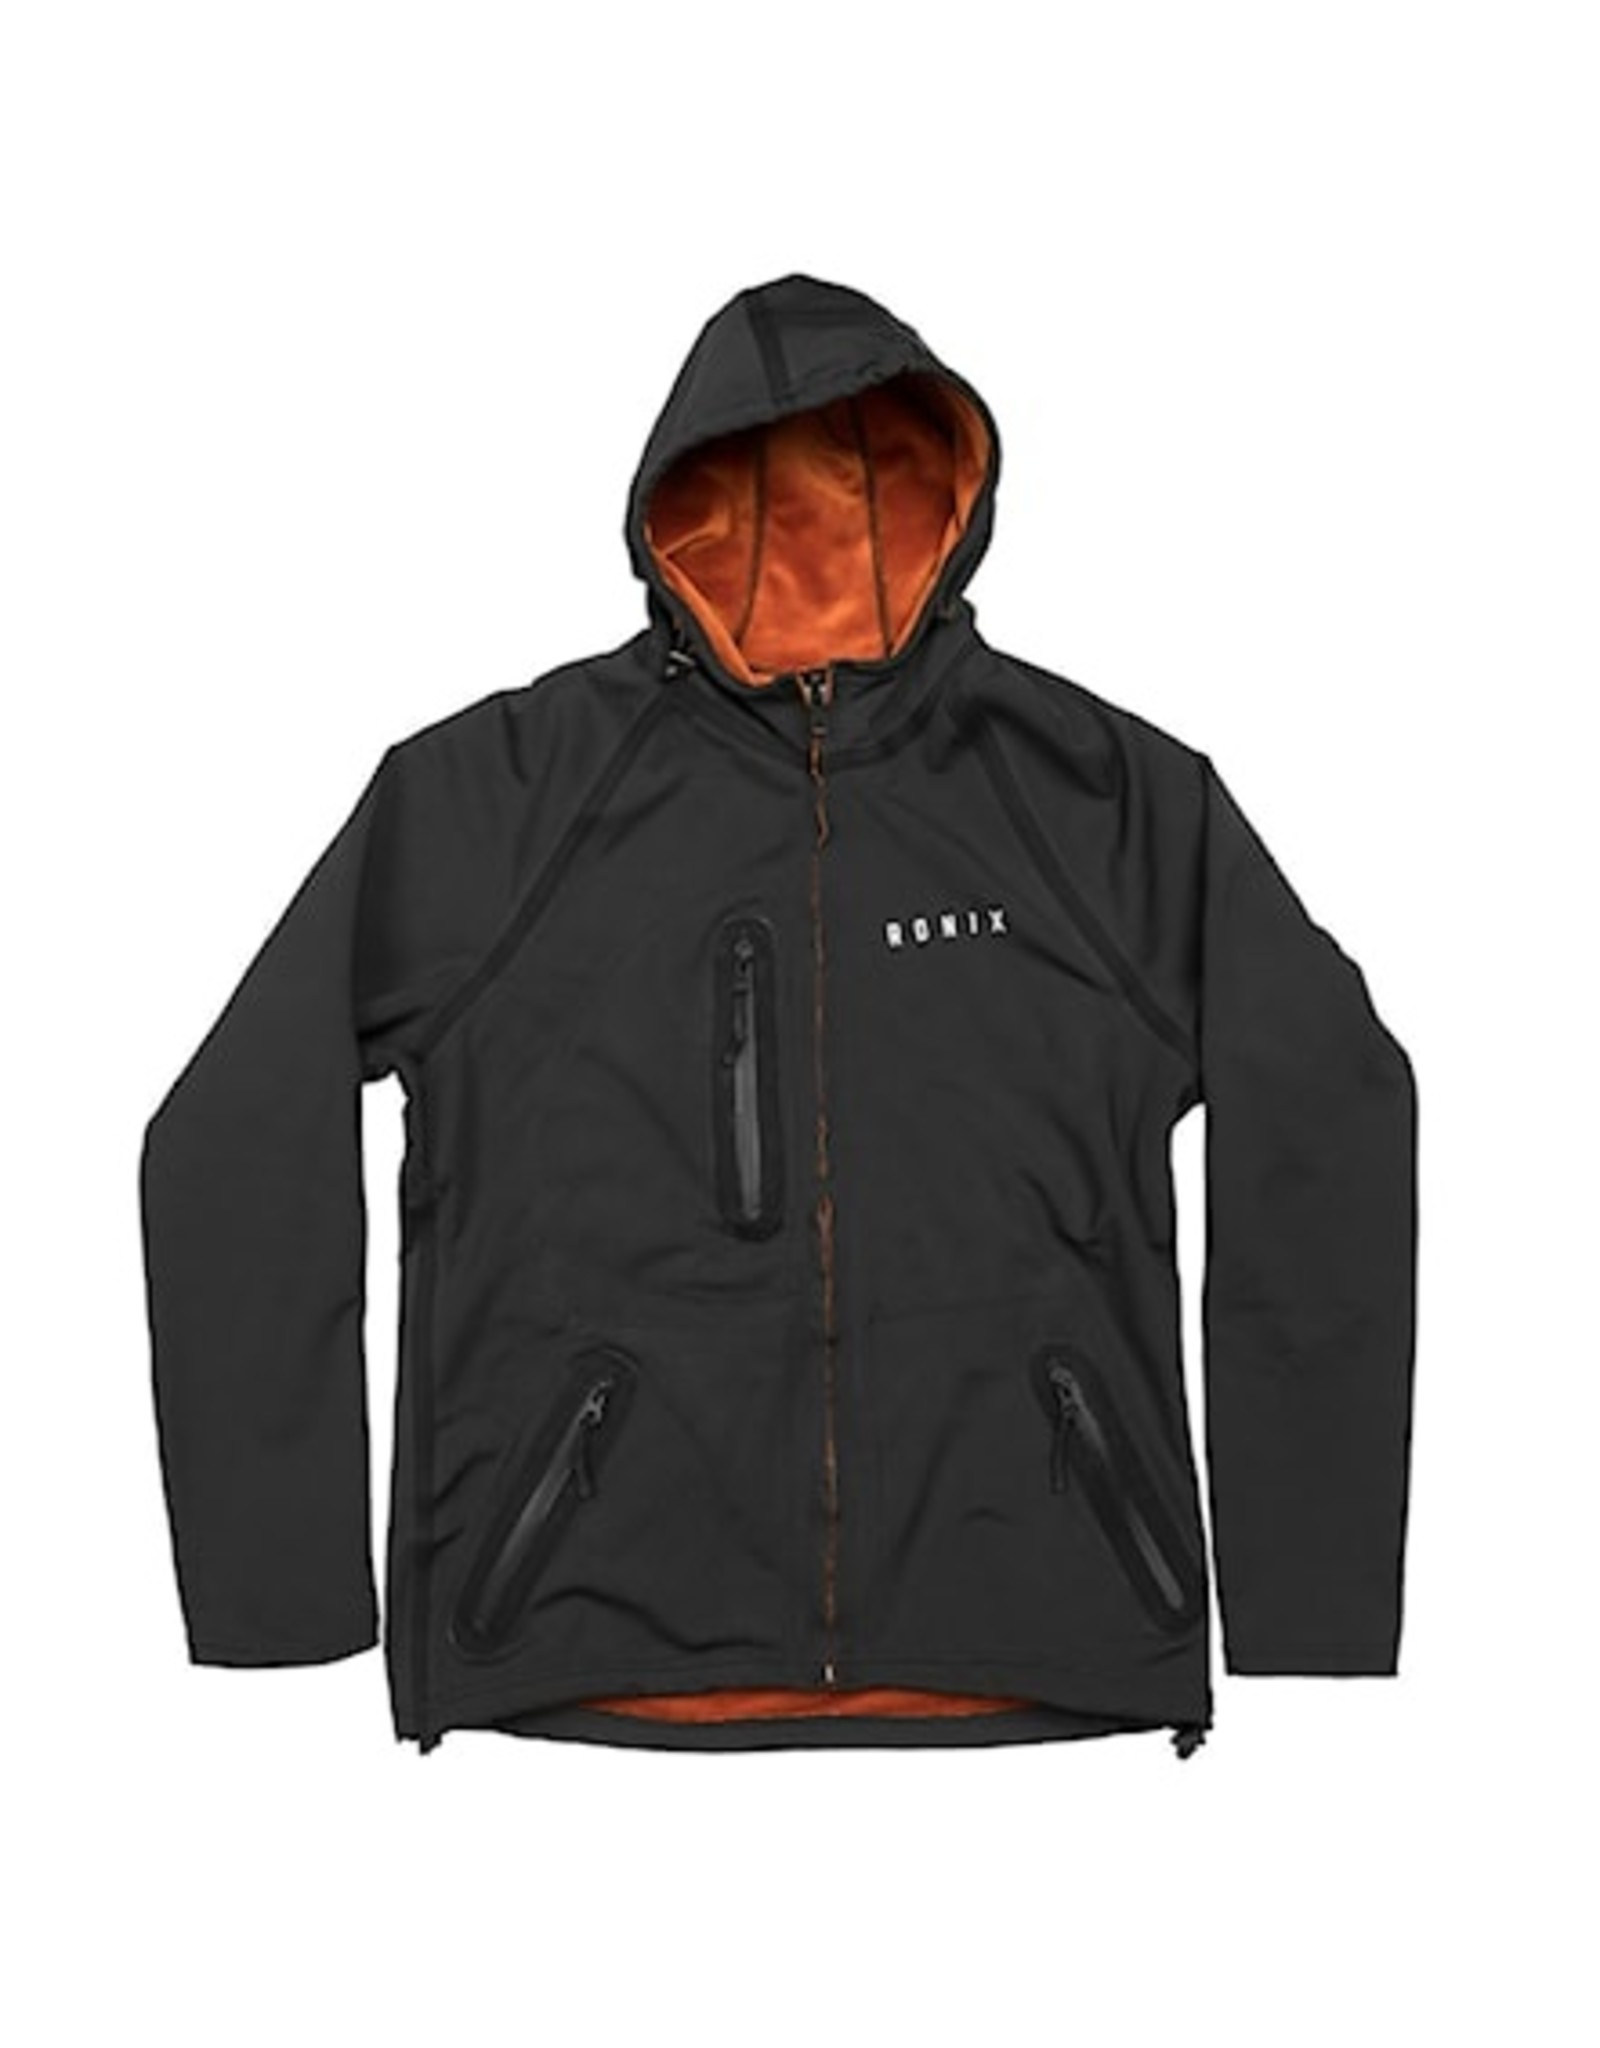 Ronix Wet / Dry Neo Shell - Black / Orange